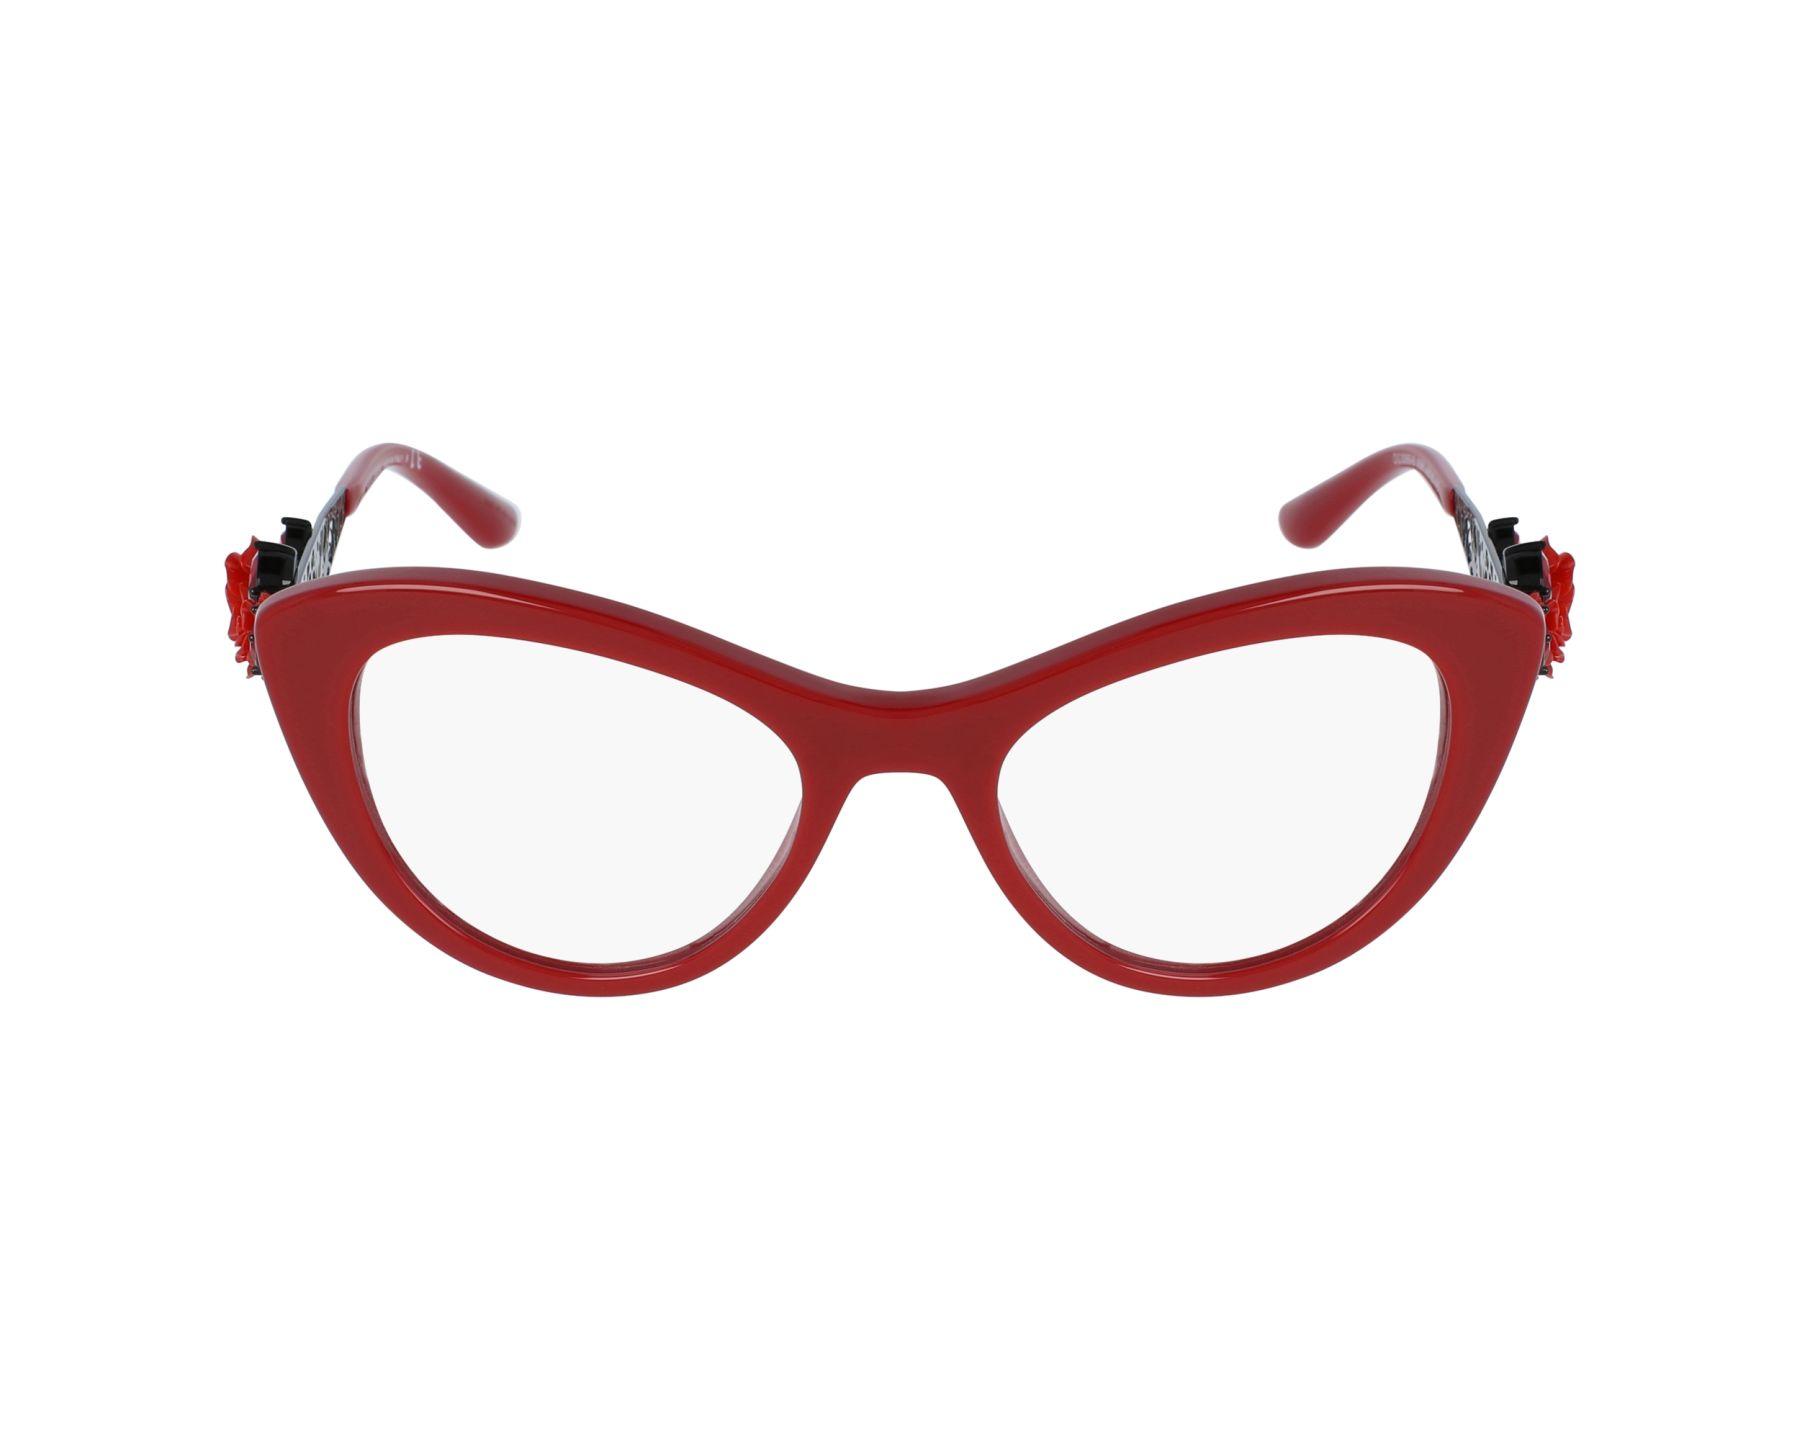 Dolce & Gabbana Eyeglasses Red DG-3265-B 3088 - Visionet US